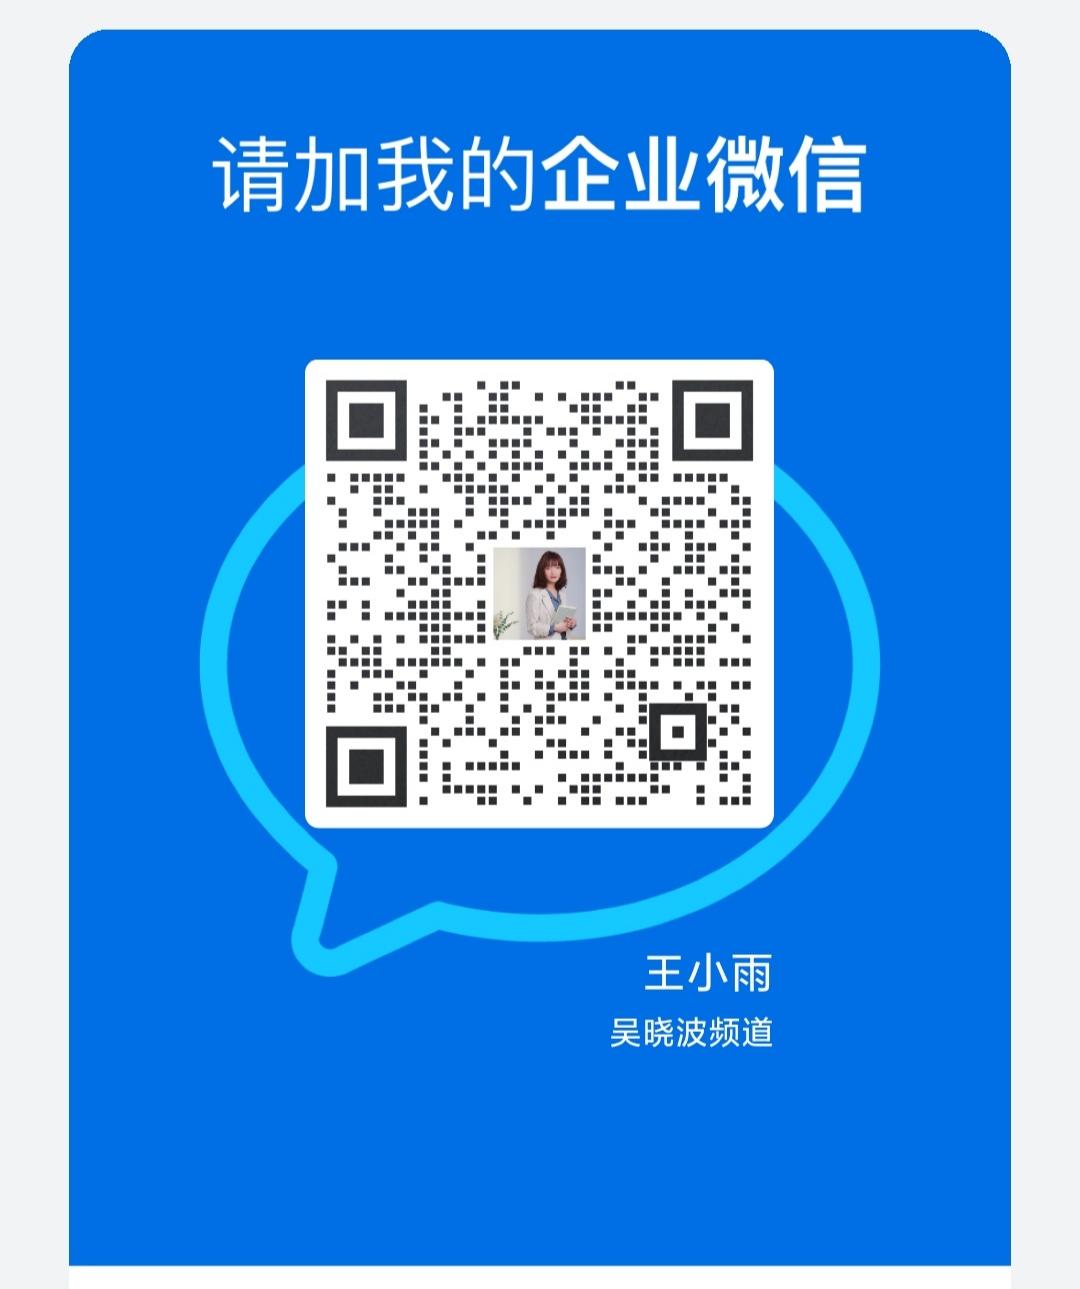 http://www.huodongxing.com/file/20210414/1824121707231/474303450571530.jpg